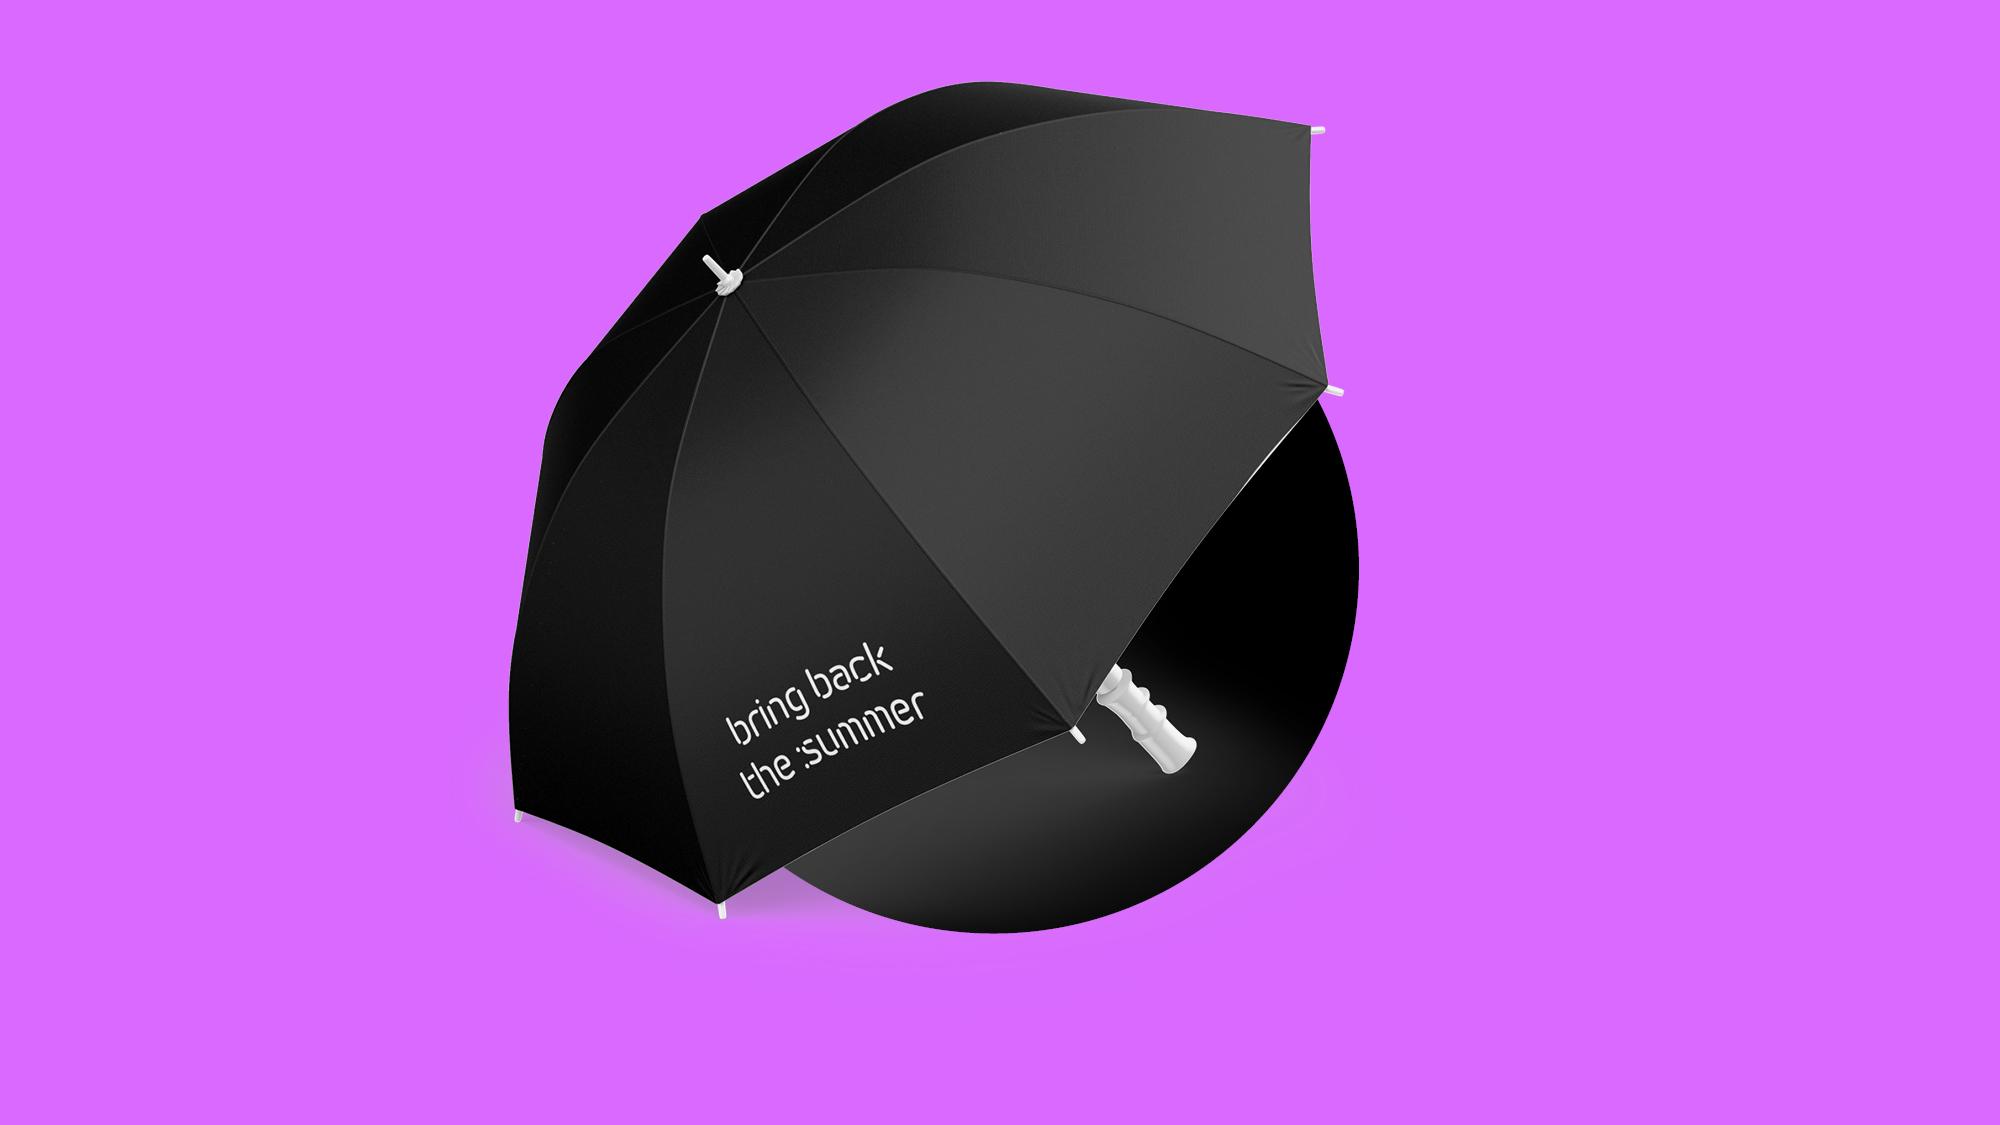 Lanatta-Branding-and-Design-Hiperstream8